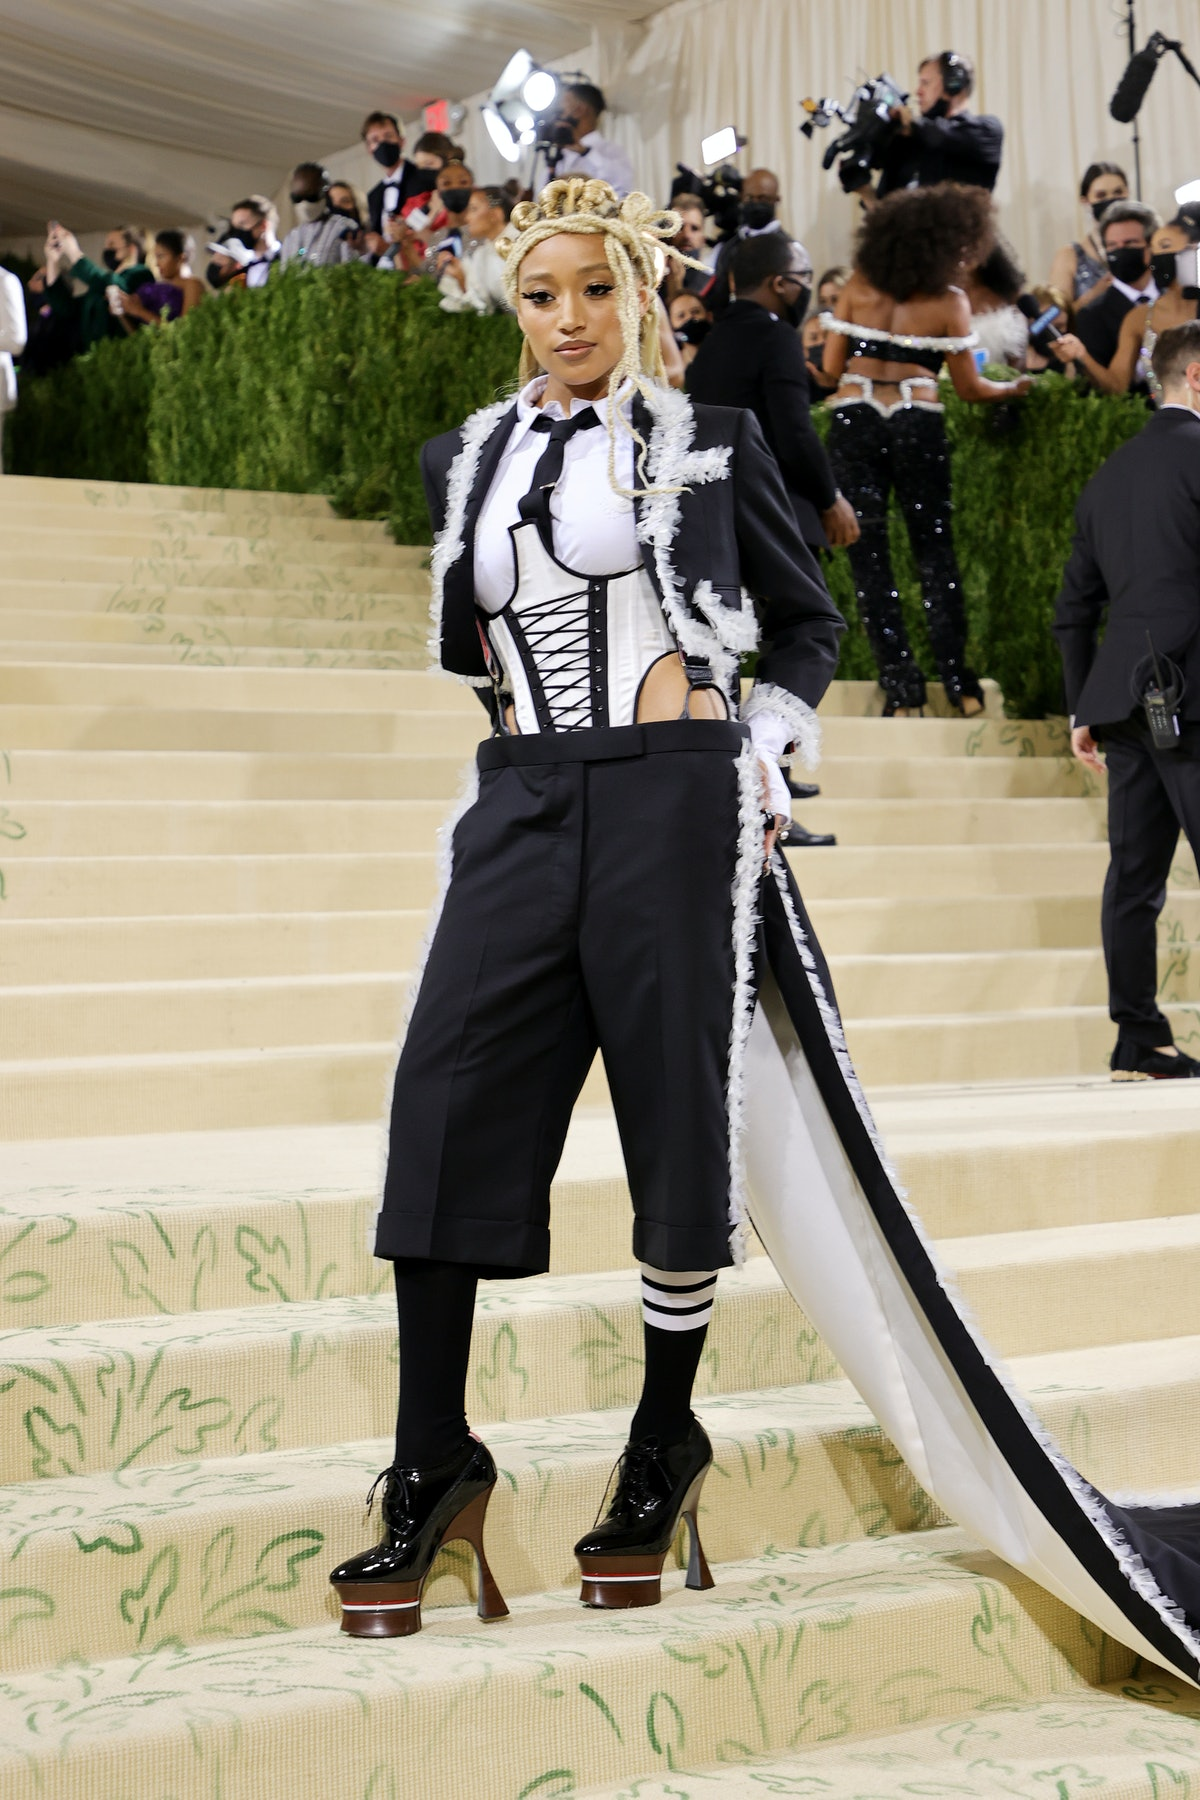 NEW YORK, NEW YORK - SEPTEMBER 13: Amandla Stenberg attends The 2021 Met Gala Celebrating In America...